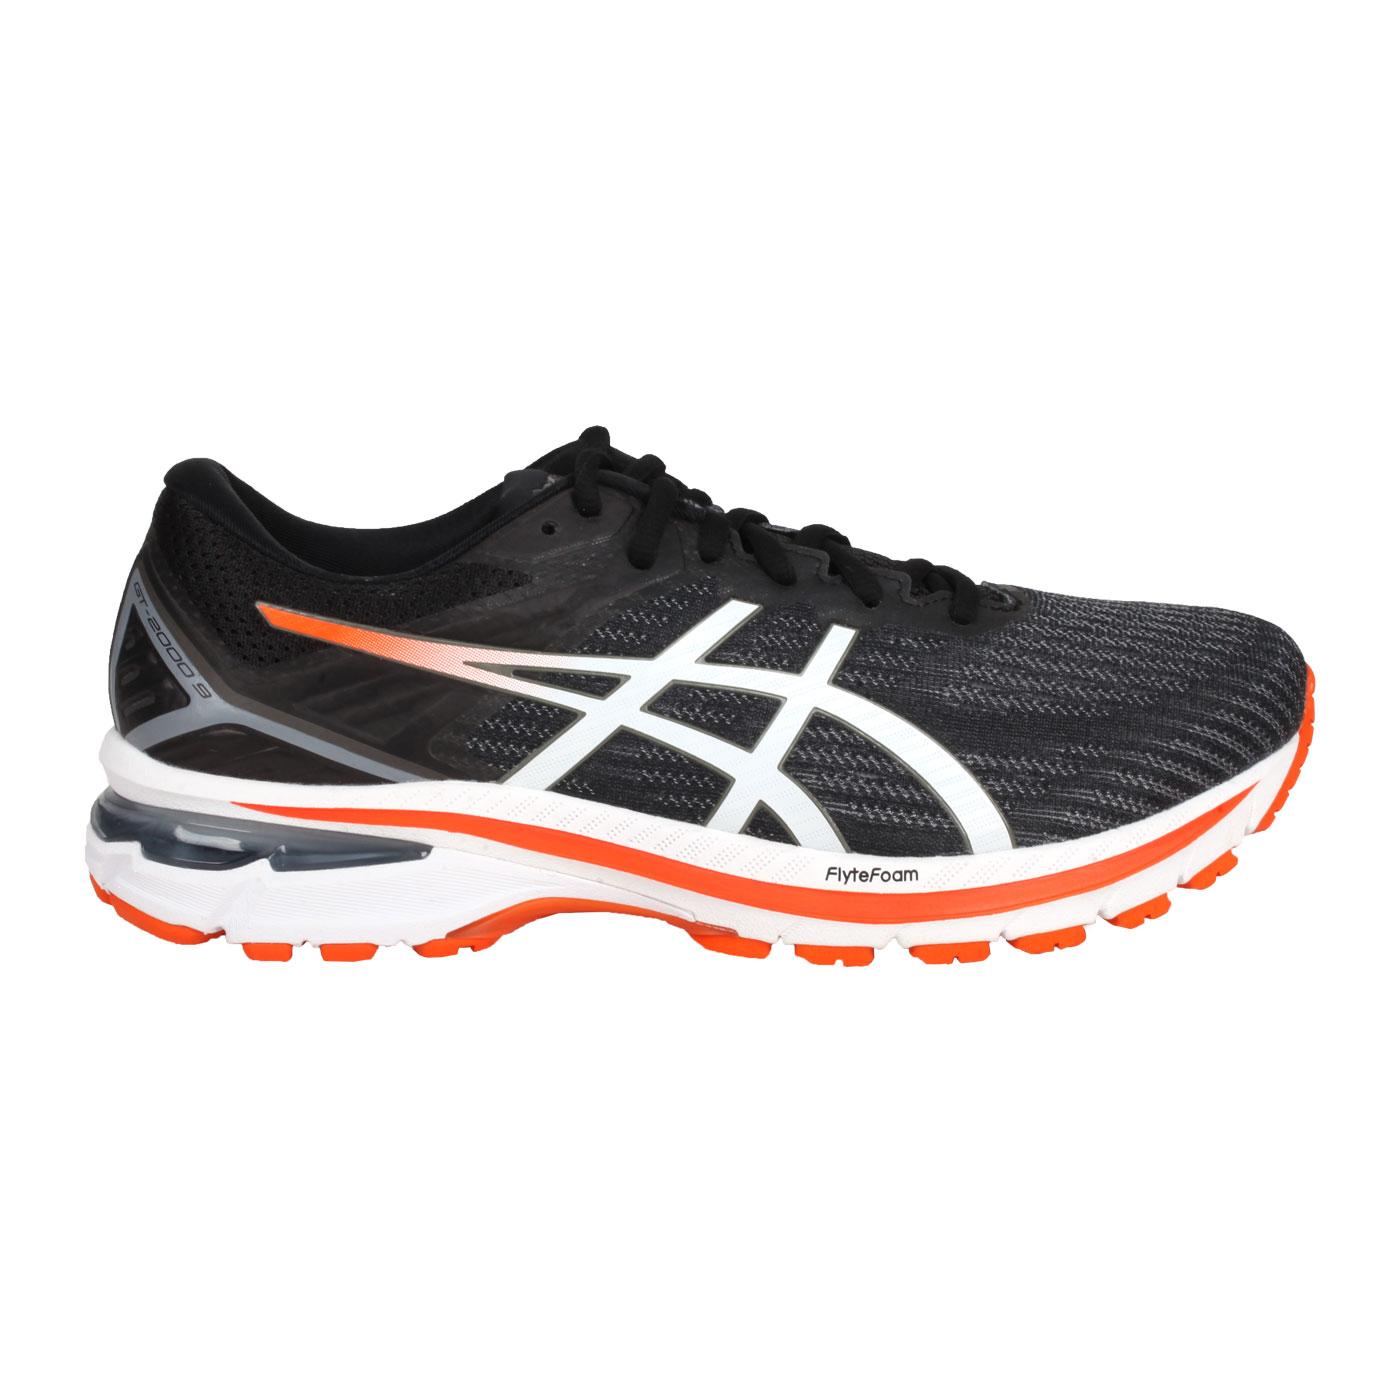 ASICS 男款慢跑鞋-4E  @GT-2000 9@1011A987-004